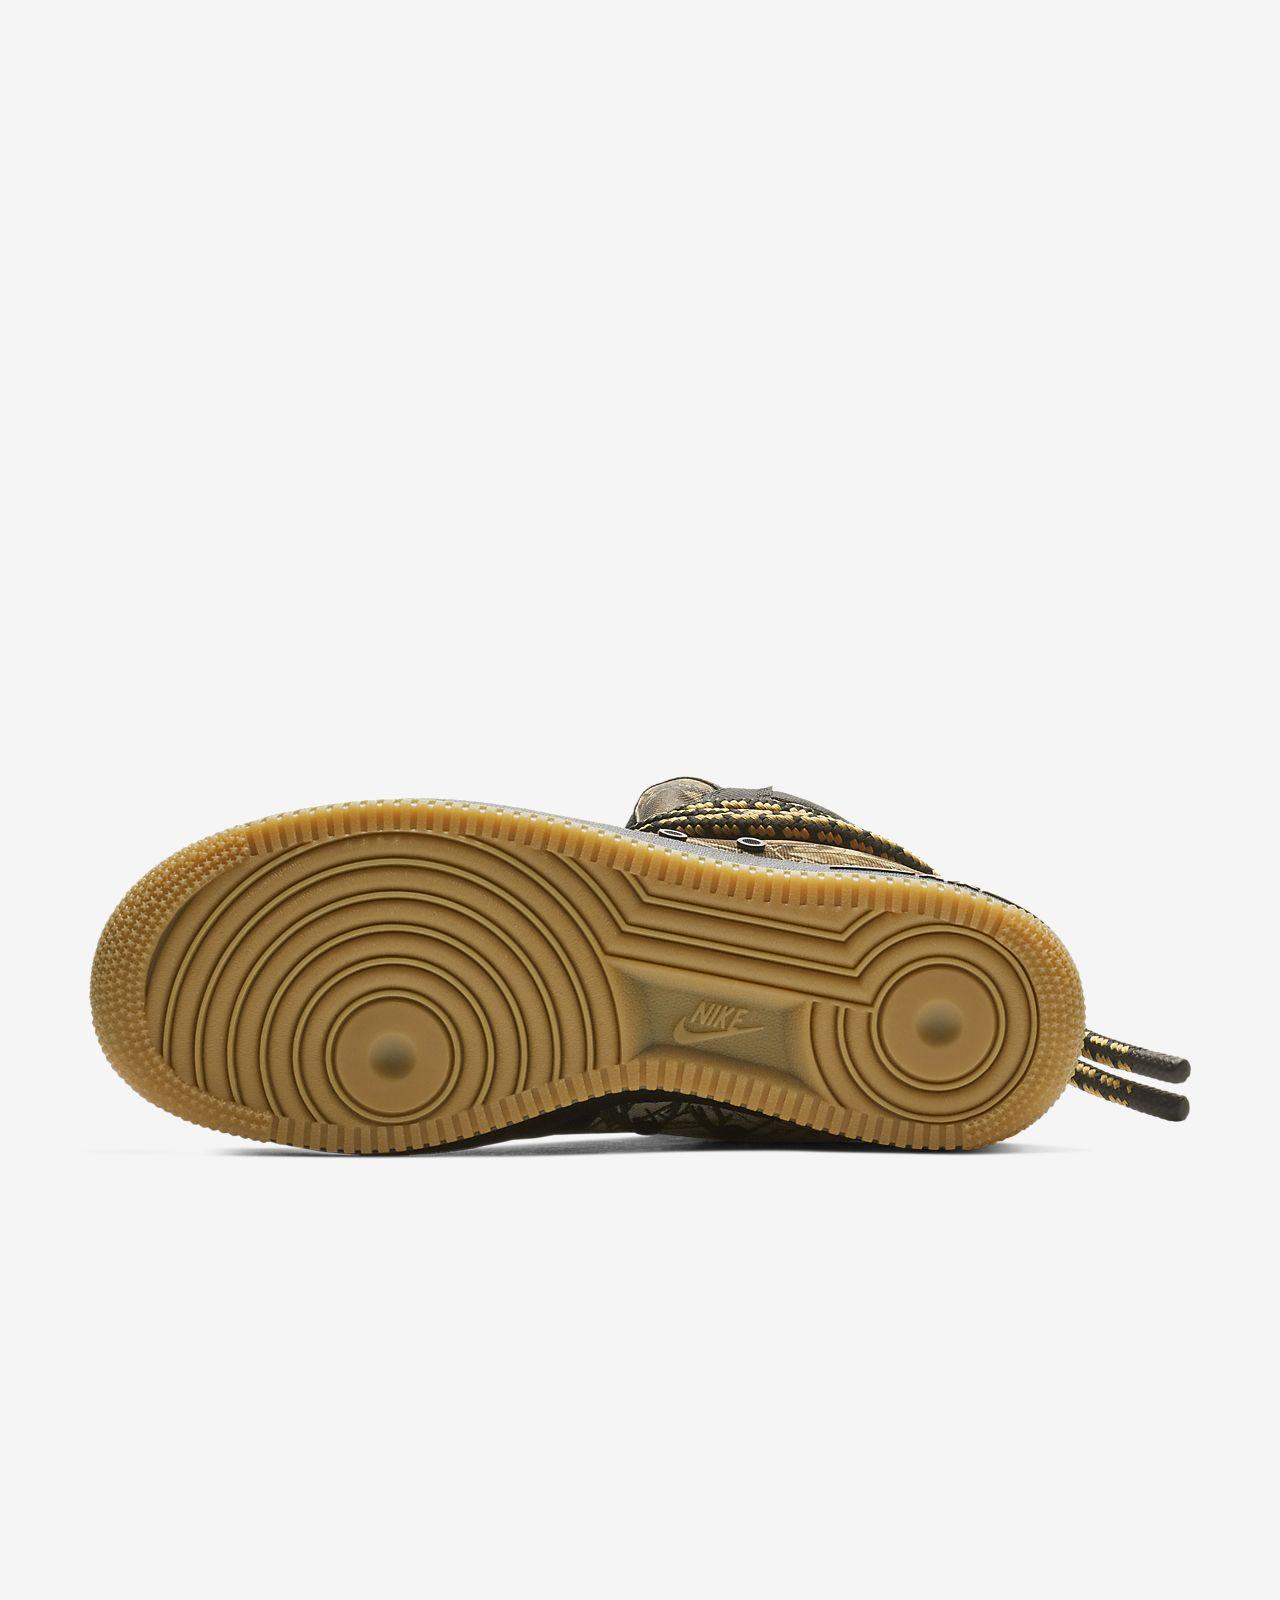 Nike SF Air Force 1 Realtree® High Men's Boot